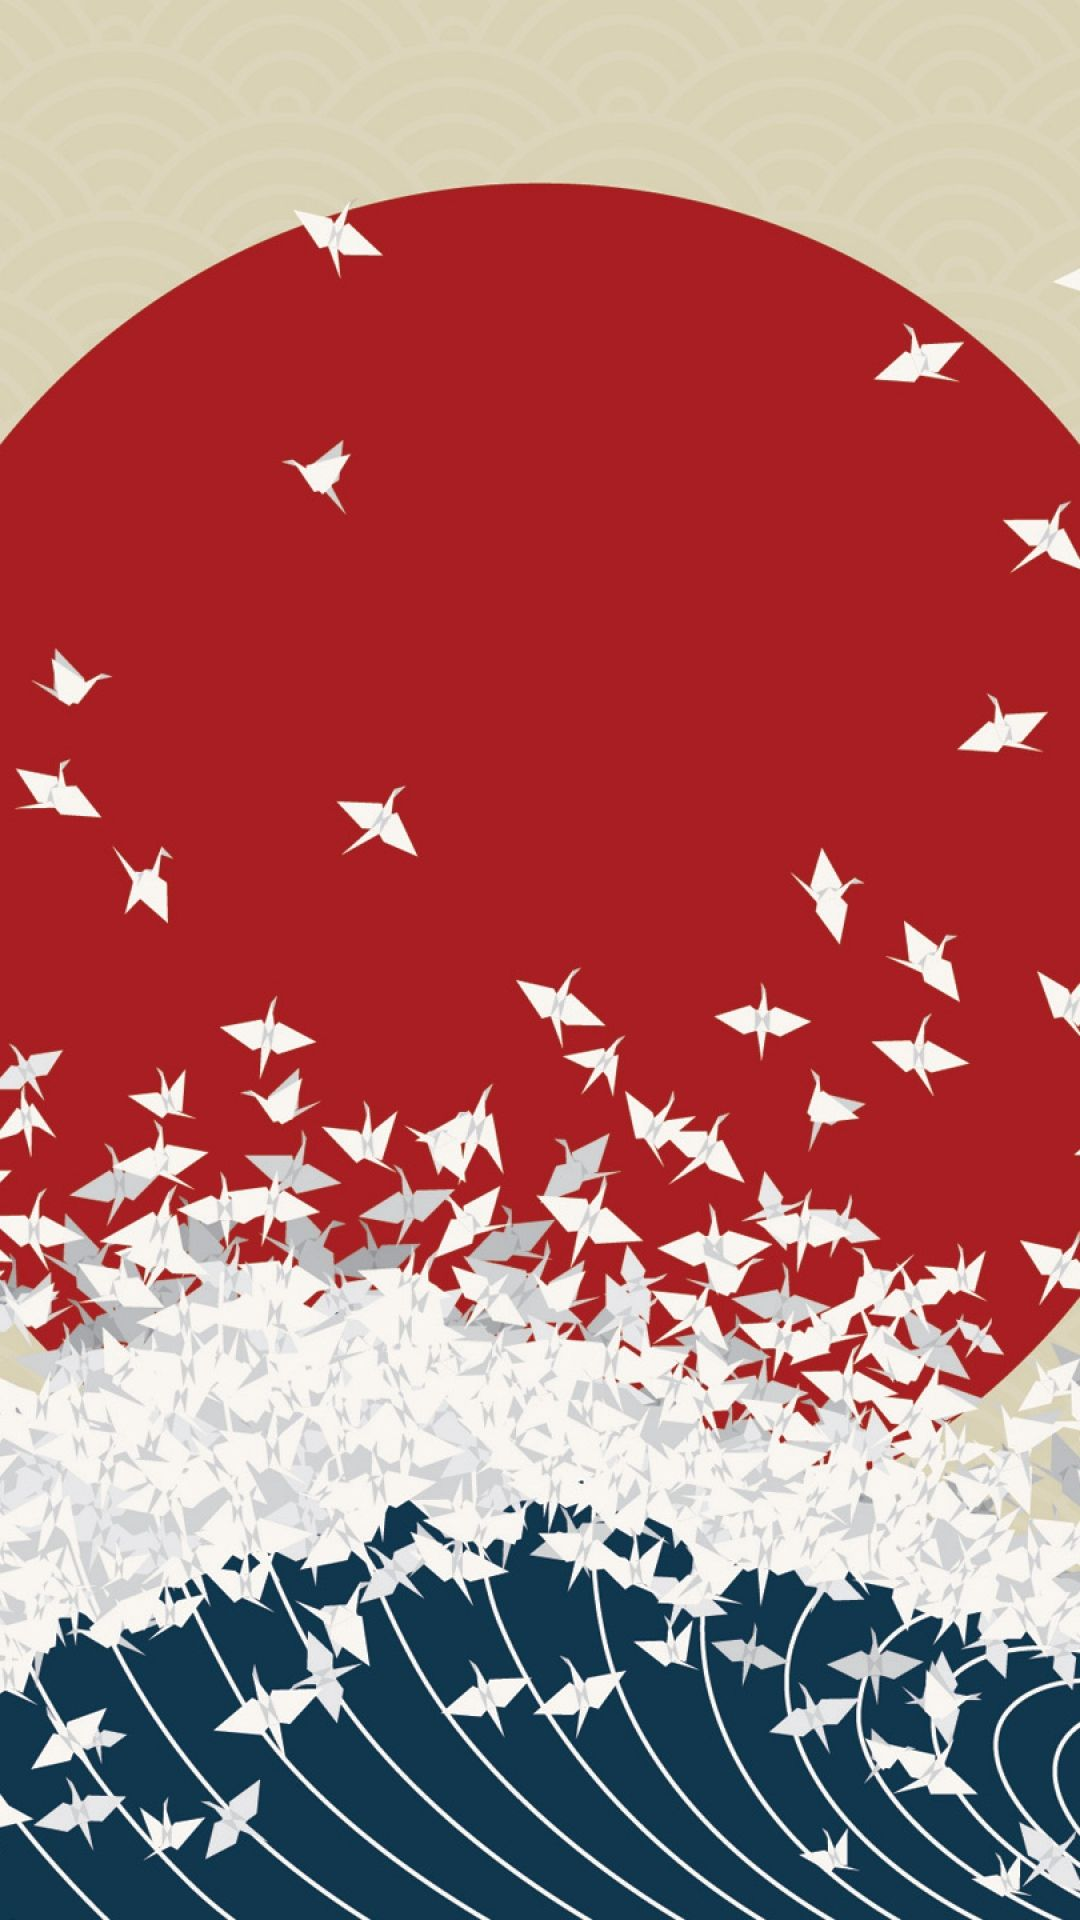 Download Wallpaper 1080x1920 Minimalism Origami Japan Rising